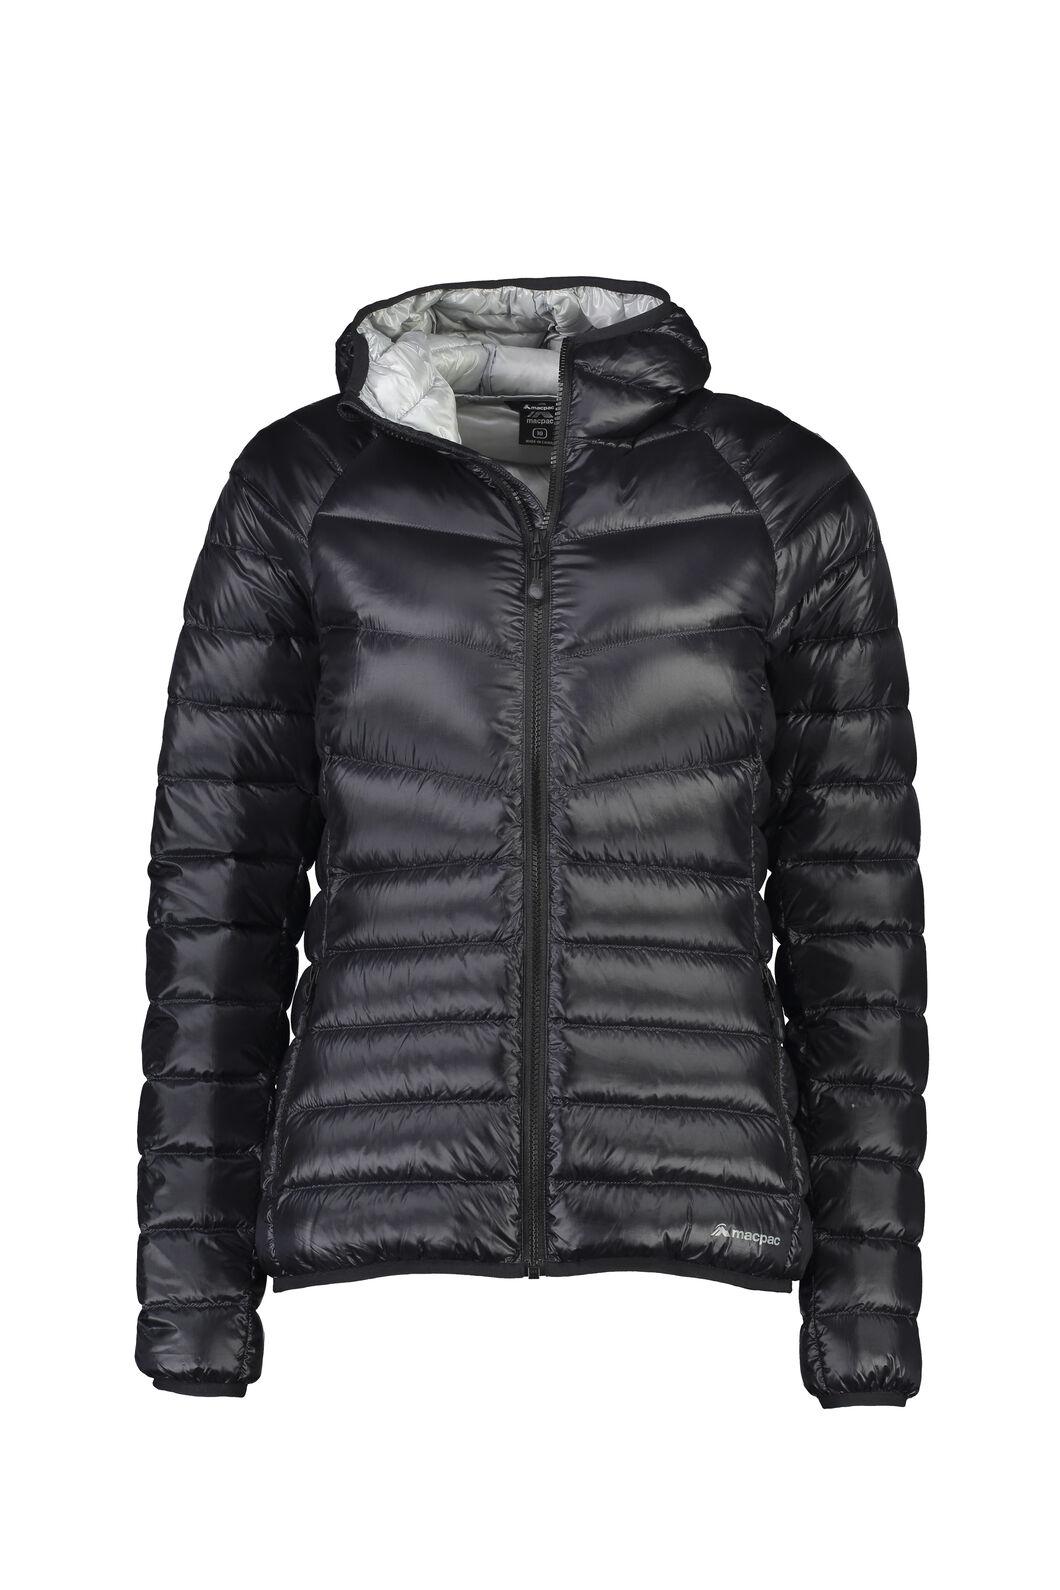 Macpac Mercury Down Jacket - Women's, Black, hi-res